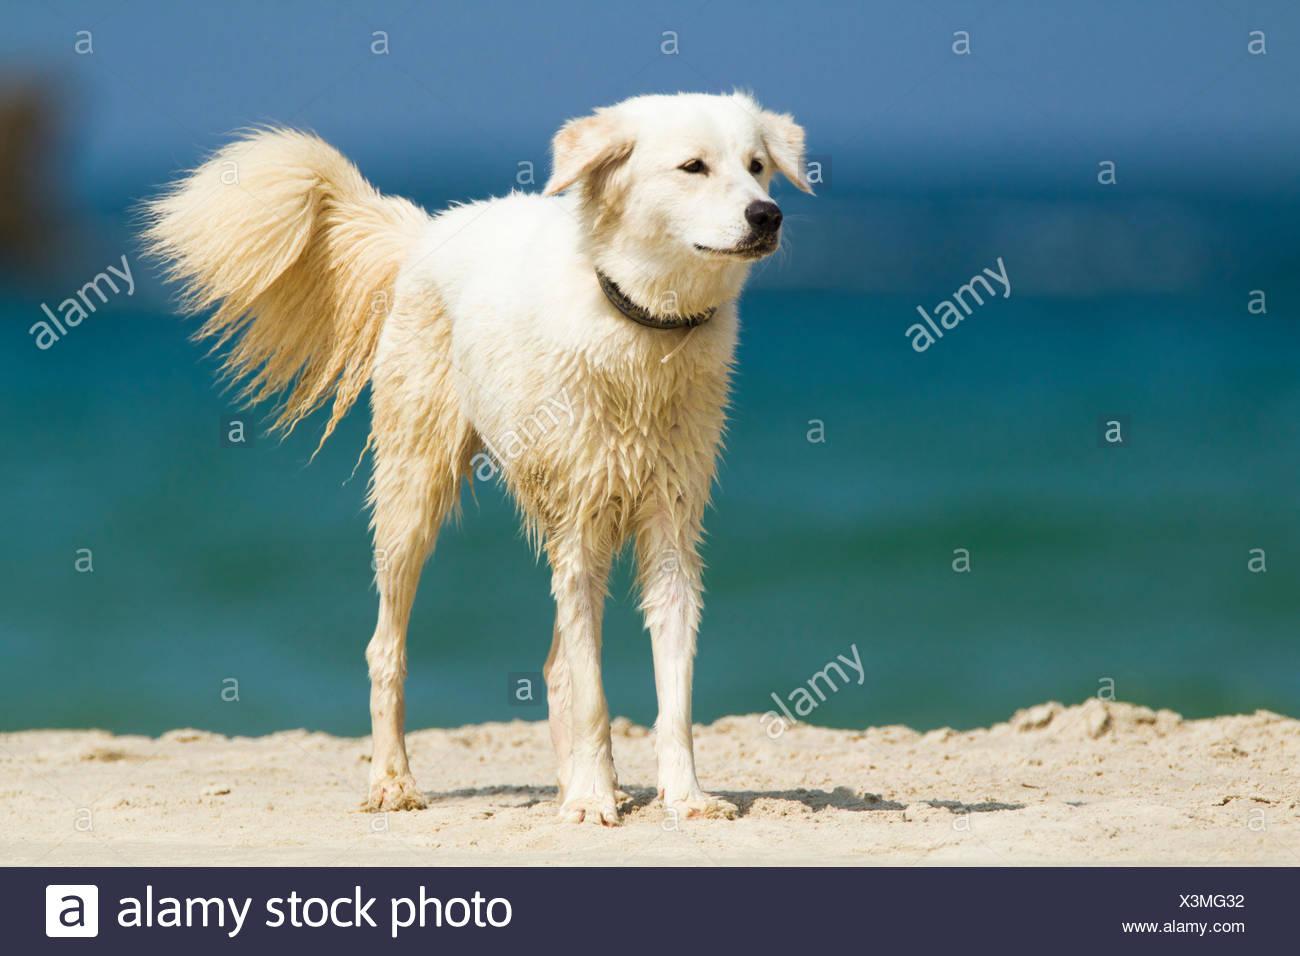 Dog plays on a beach - Stock Image